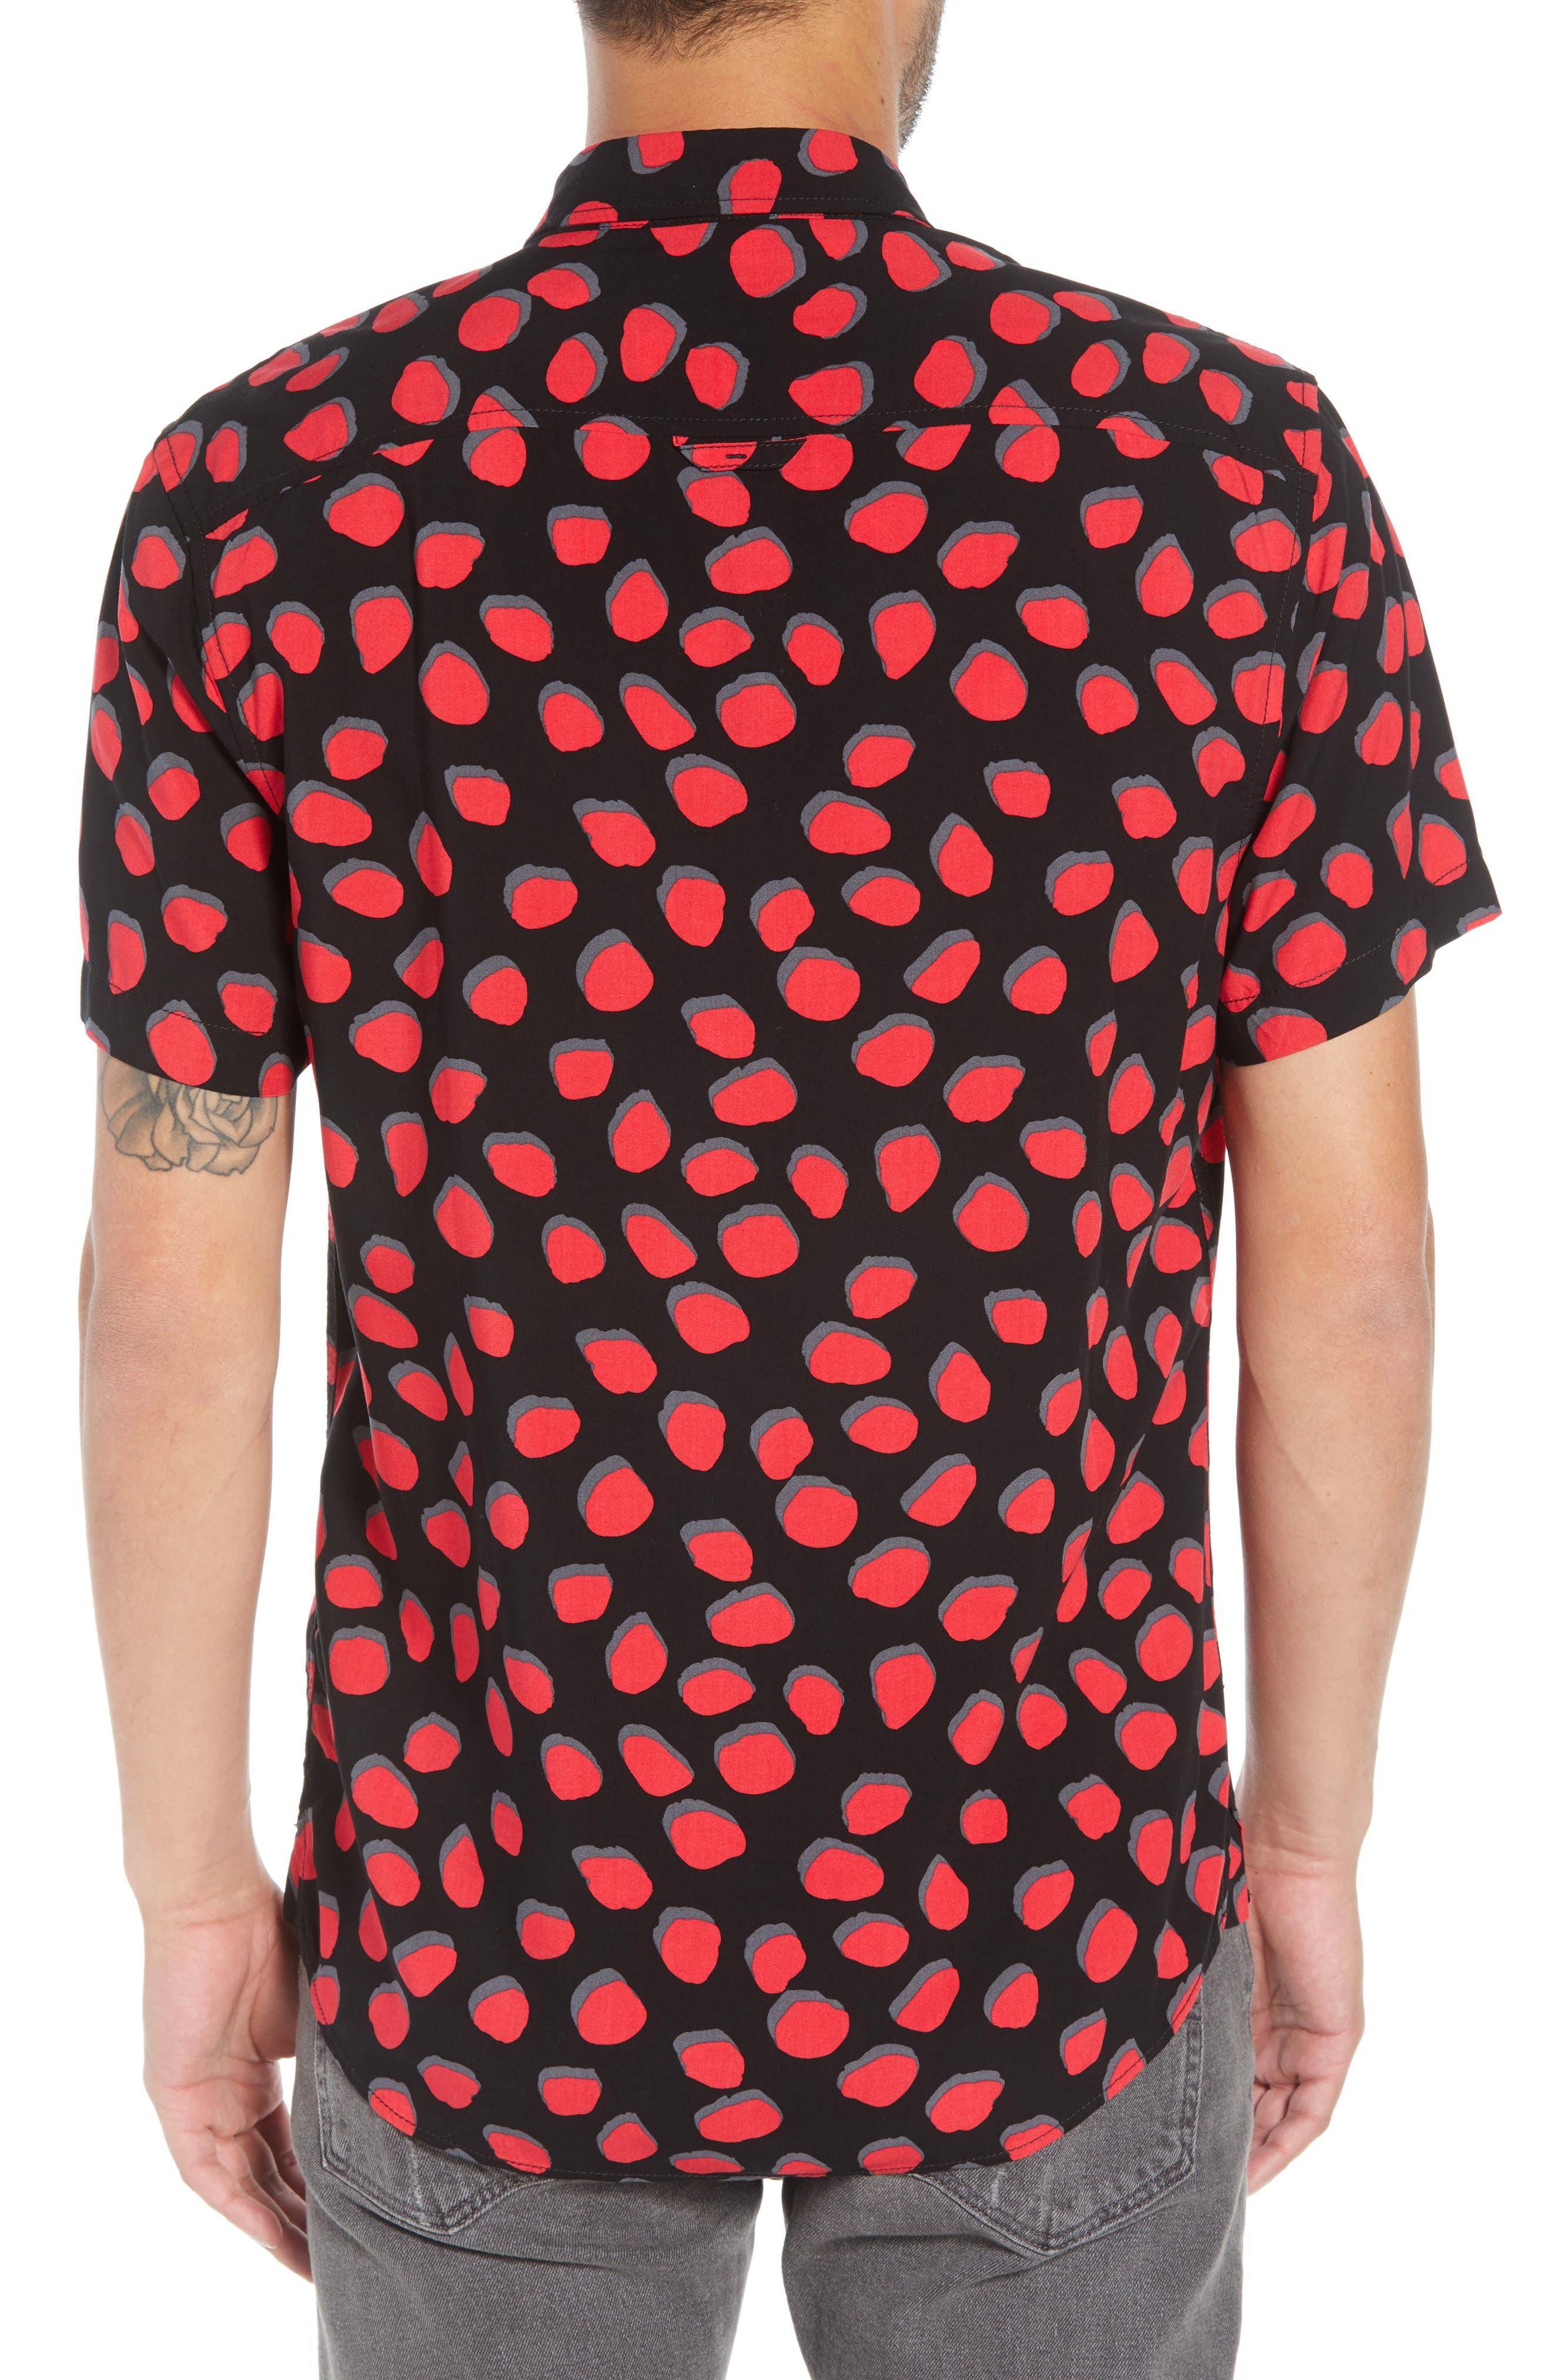 Dot Print Woven Shirt,                             Alternate thumbnail 2, color,                             BLACK CORAL INKY DOTS